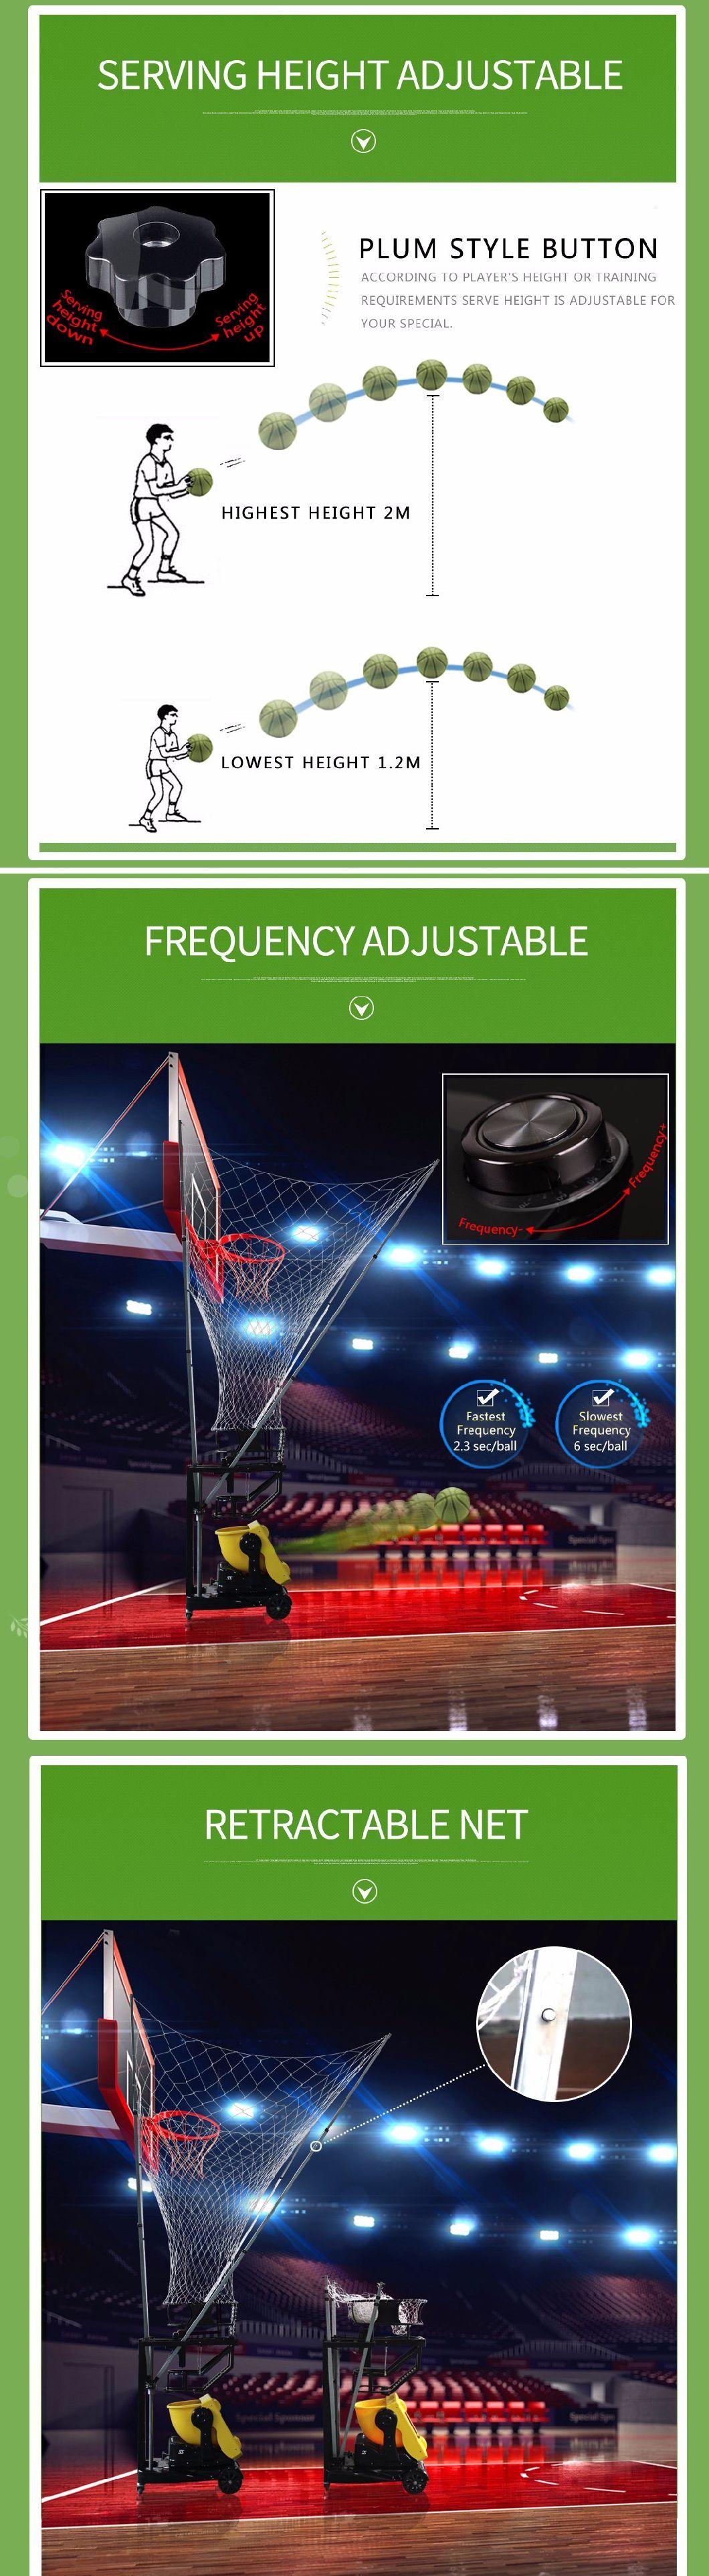 Siboasi Model (S6829) Common Basketball Machine Shooting Equipment